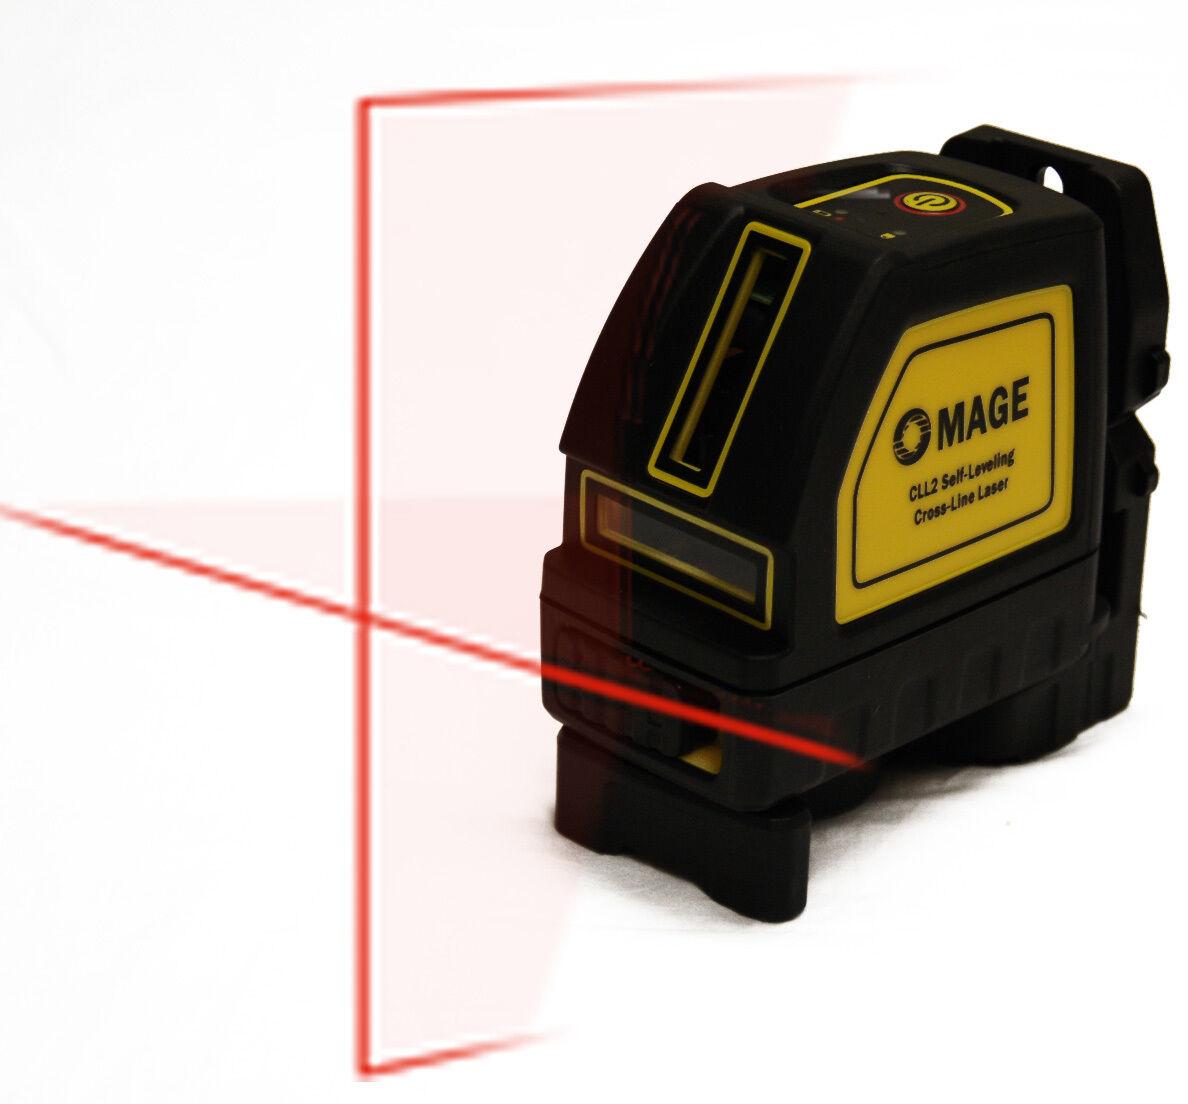 98 ft Mage Cross Line Laser Level Auto Leveling Horizontal greenical DeWalt Range